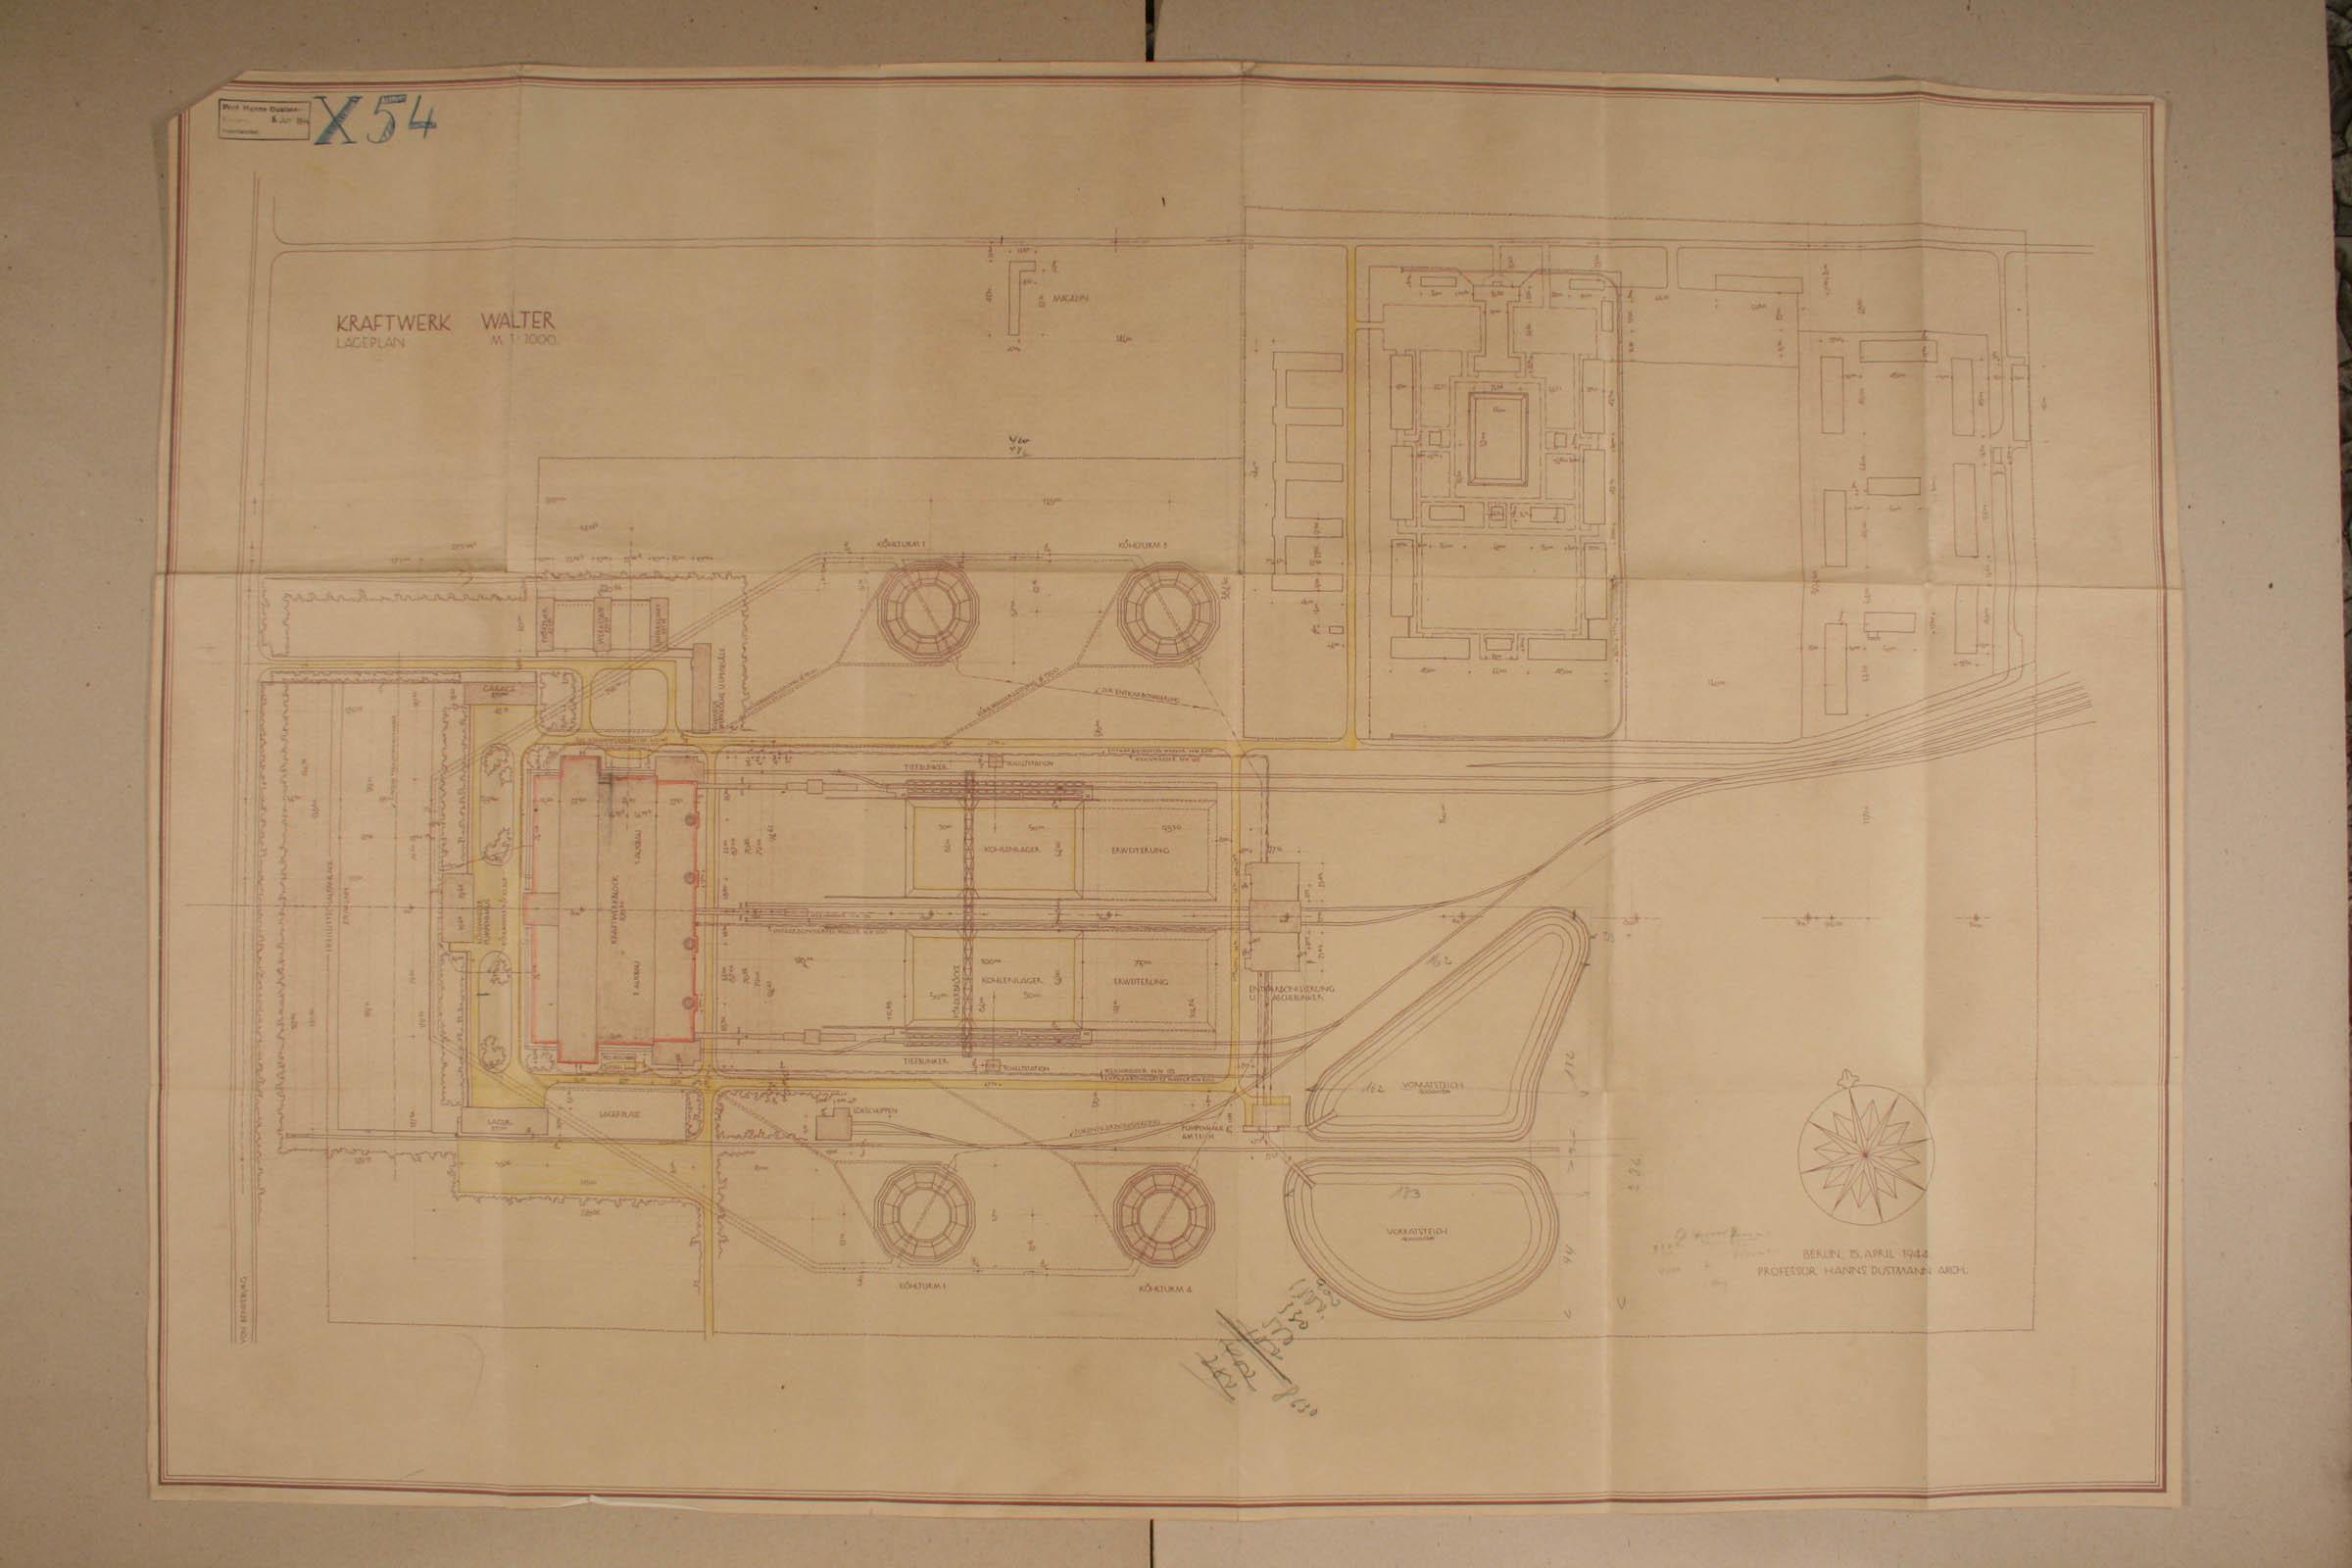 Archiwum Panstwowe w Katowicach Land 879 70 1 11